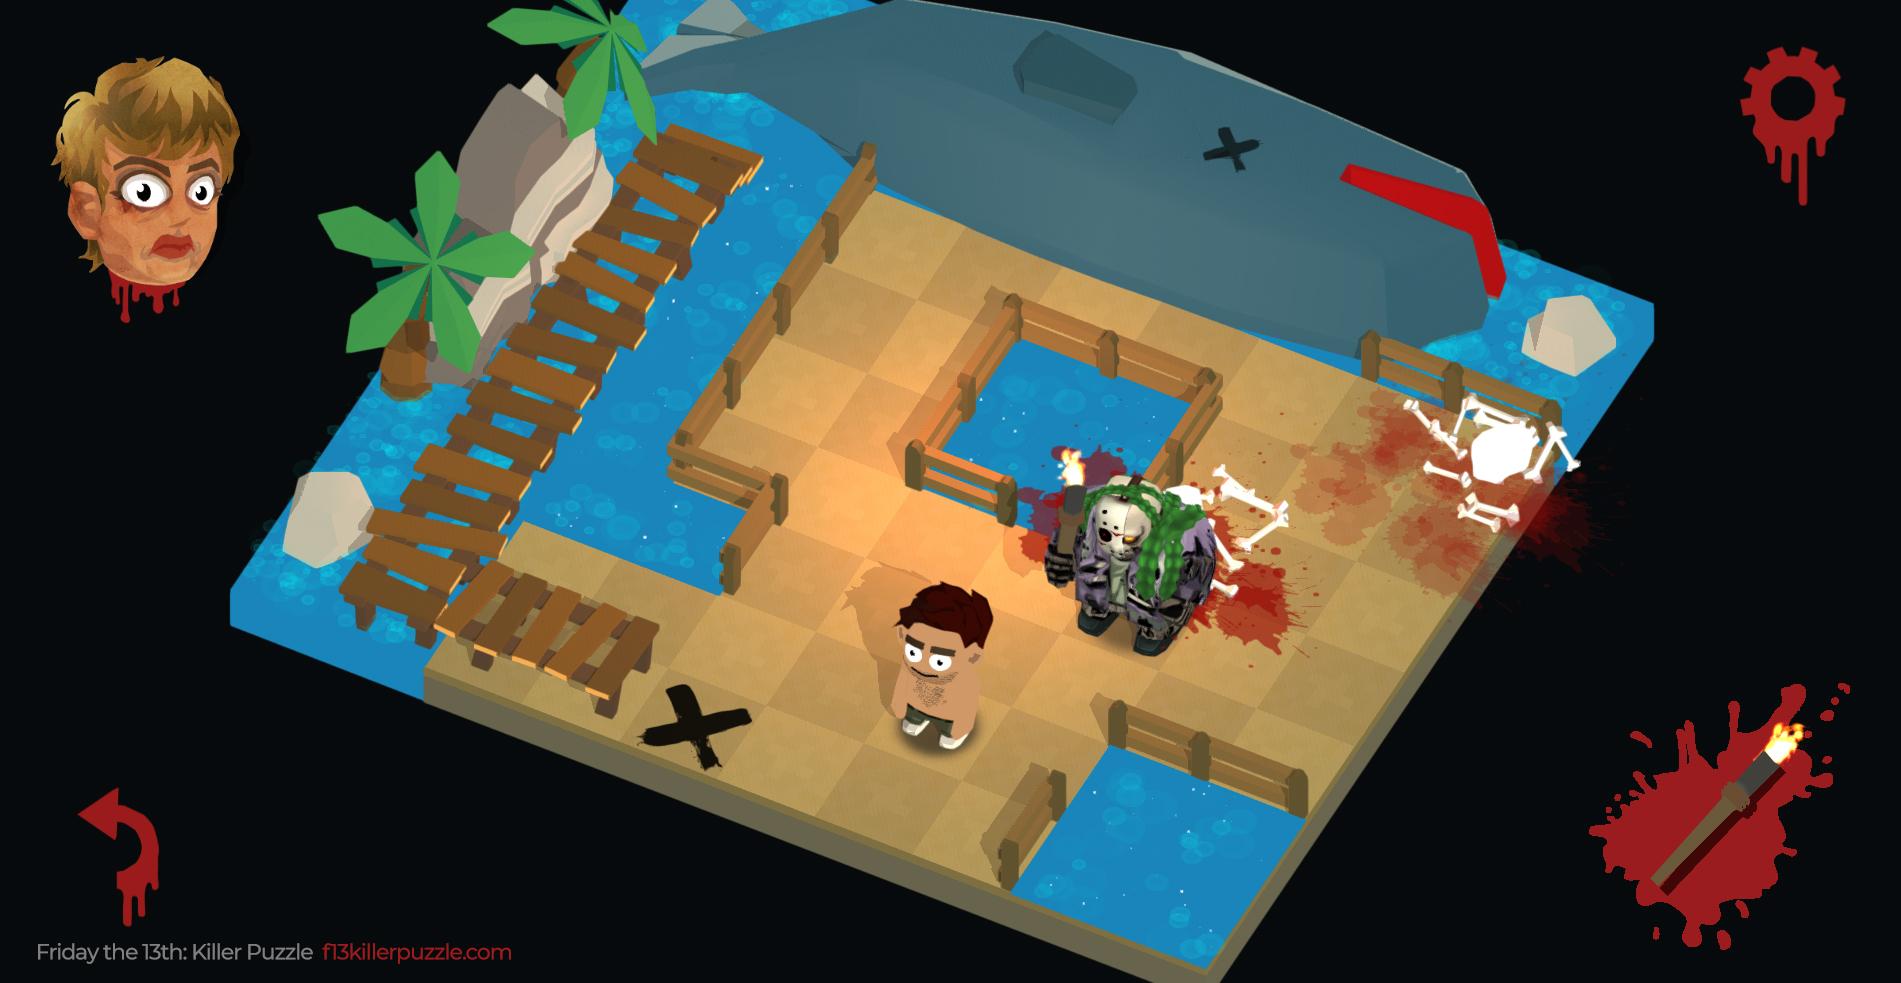 zombies vs plants jetzt spielen